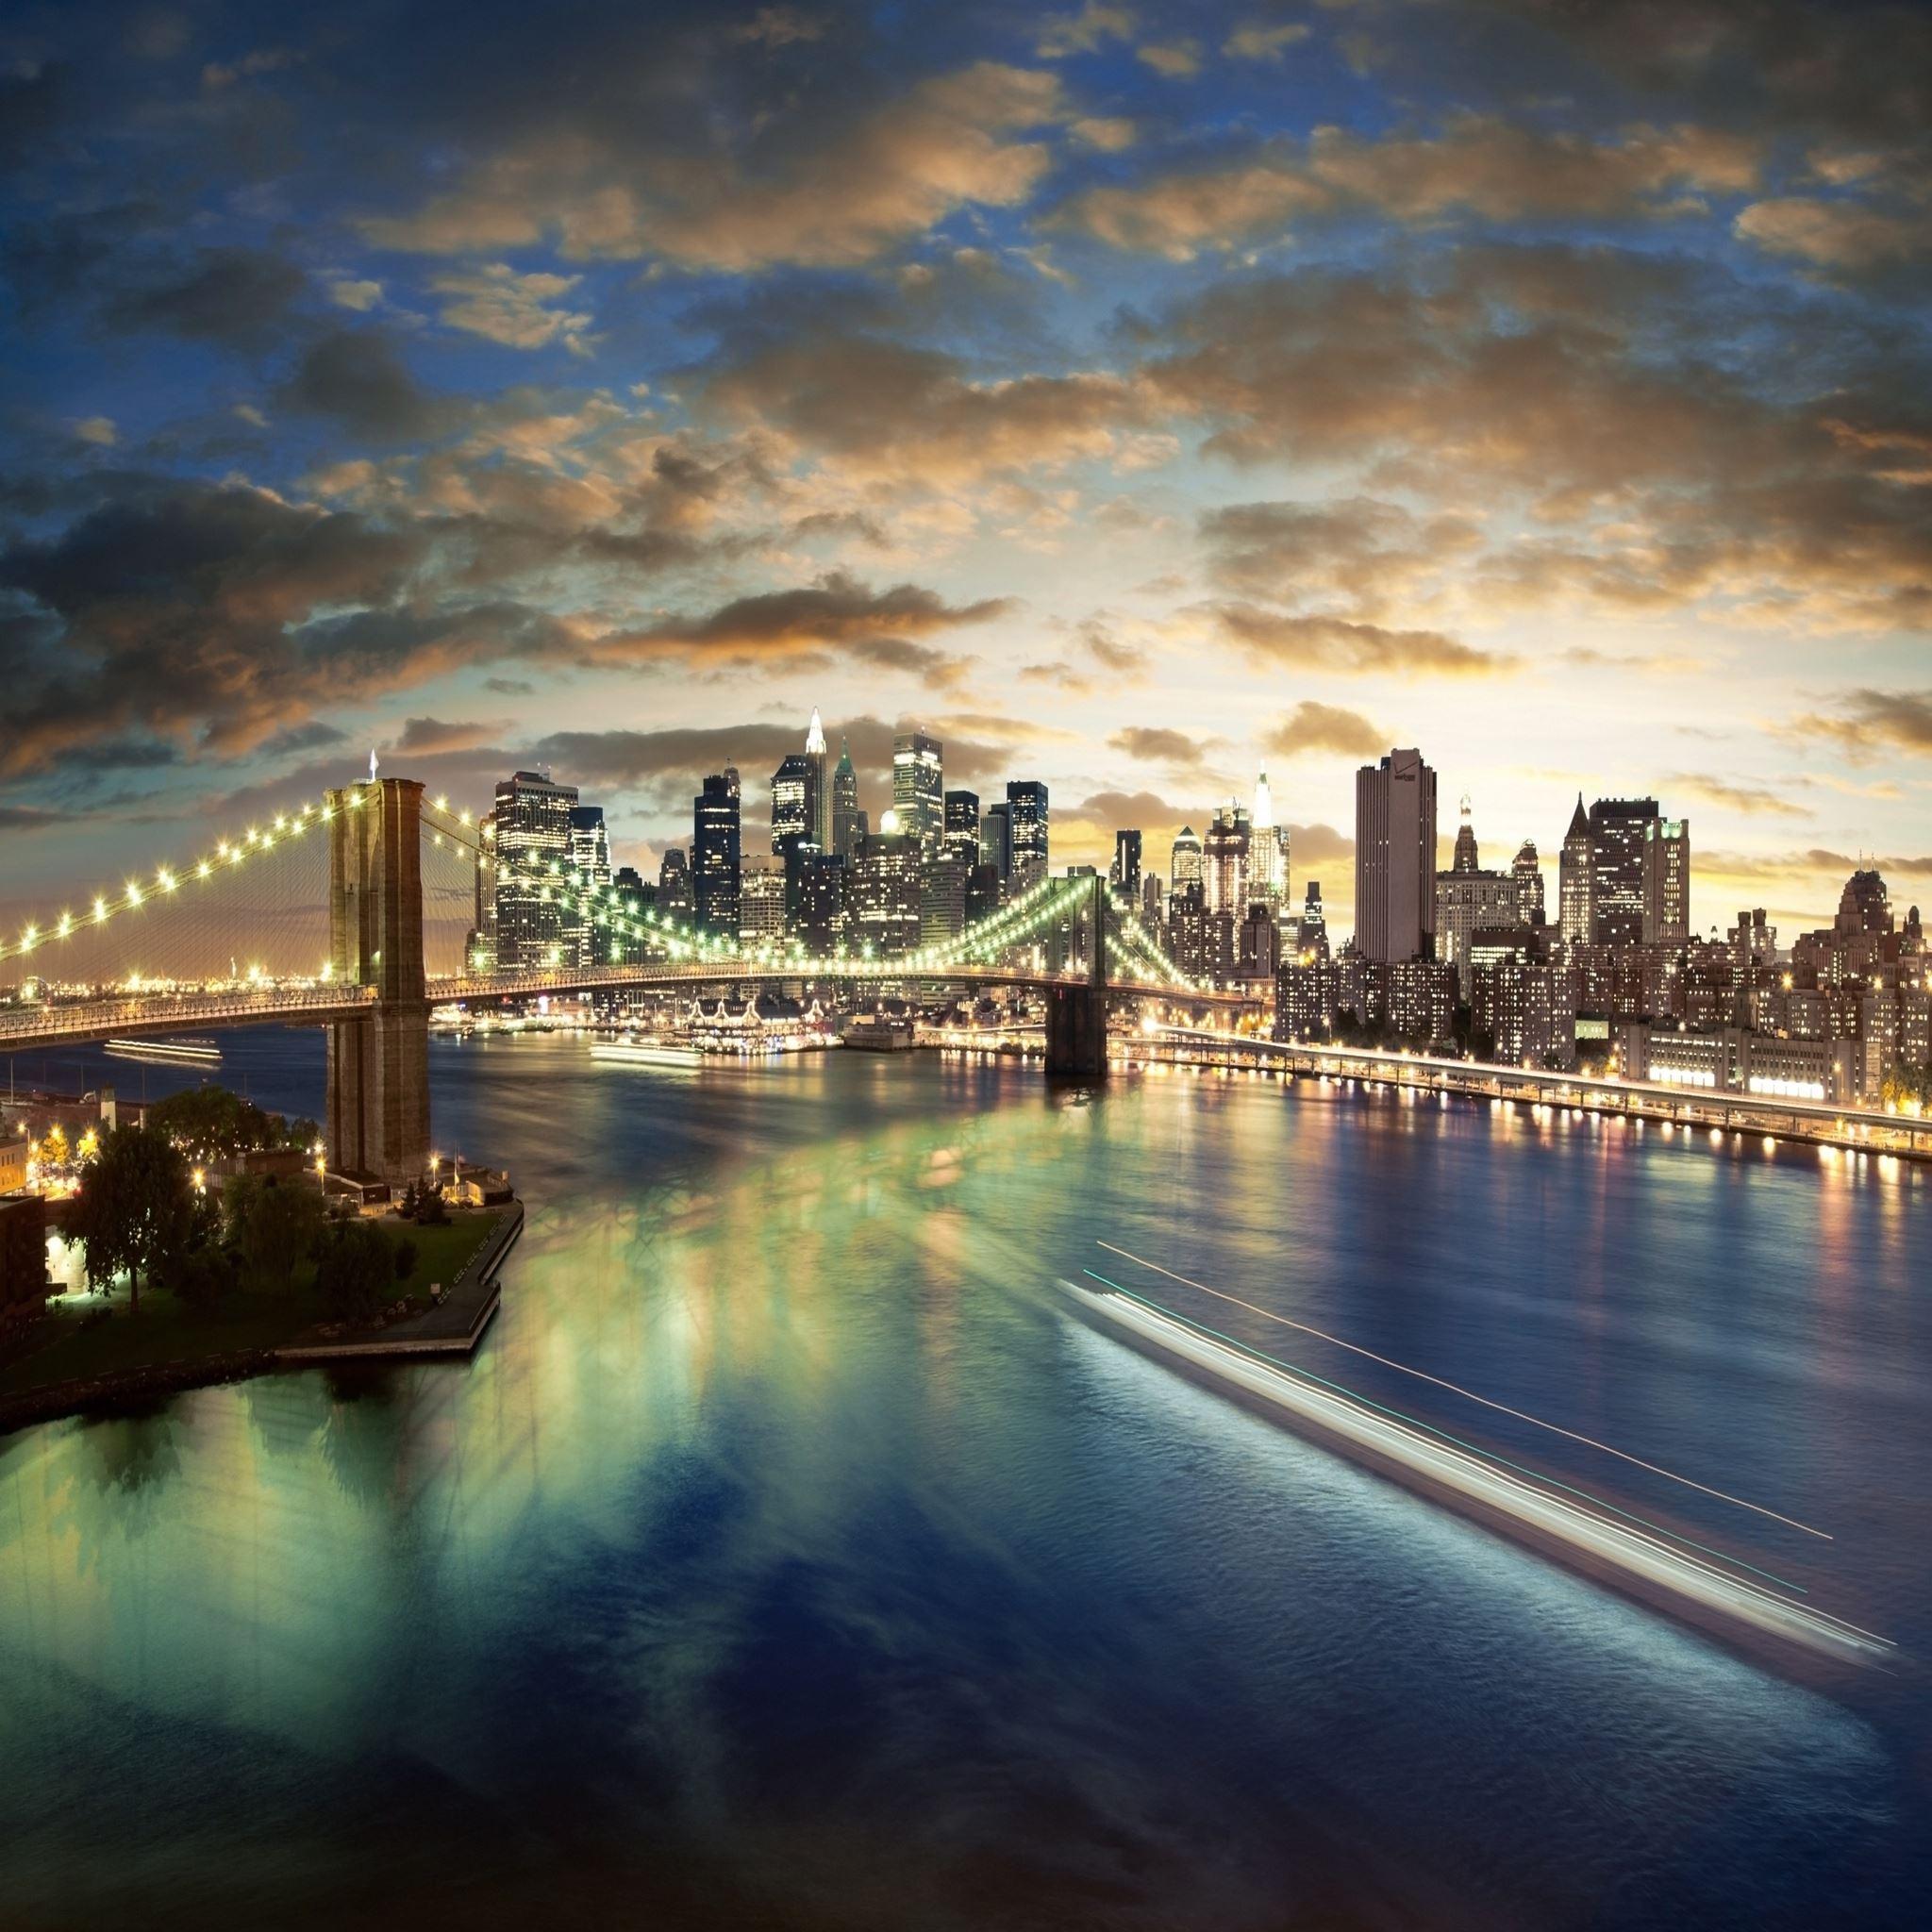 Desktop Wallpaper New: New York City Brooklyn Bridge IPad Air Wallpaper Download